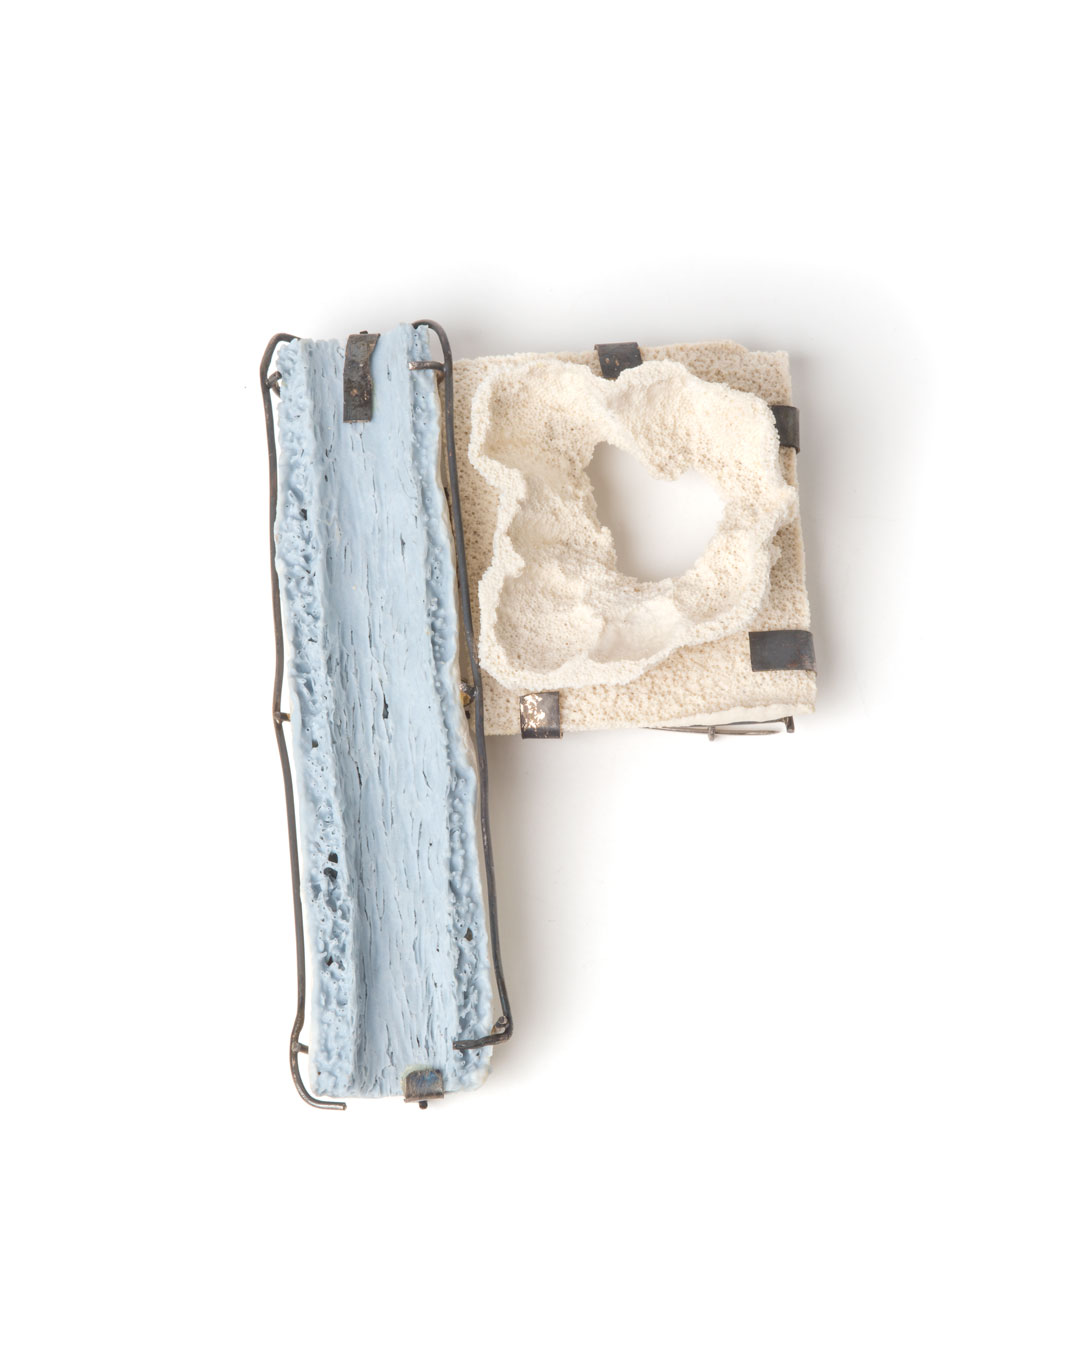 Trinidad Contreras, untitled, 2015, brooch; porcelain, oxidised silver, steel, 115 x 75 x 16 mm, €920